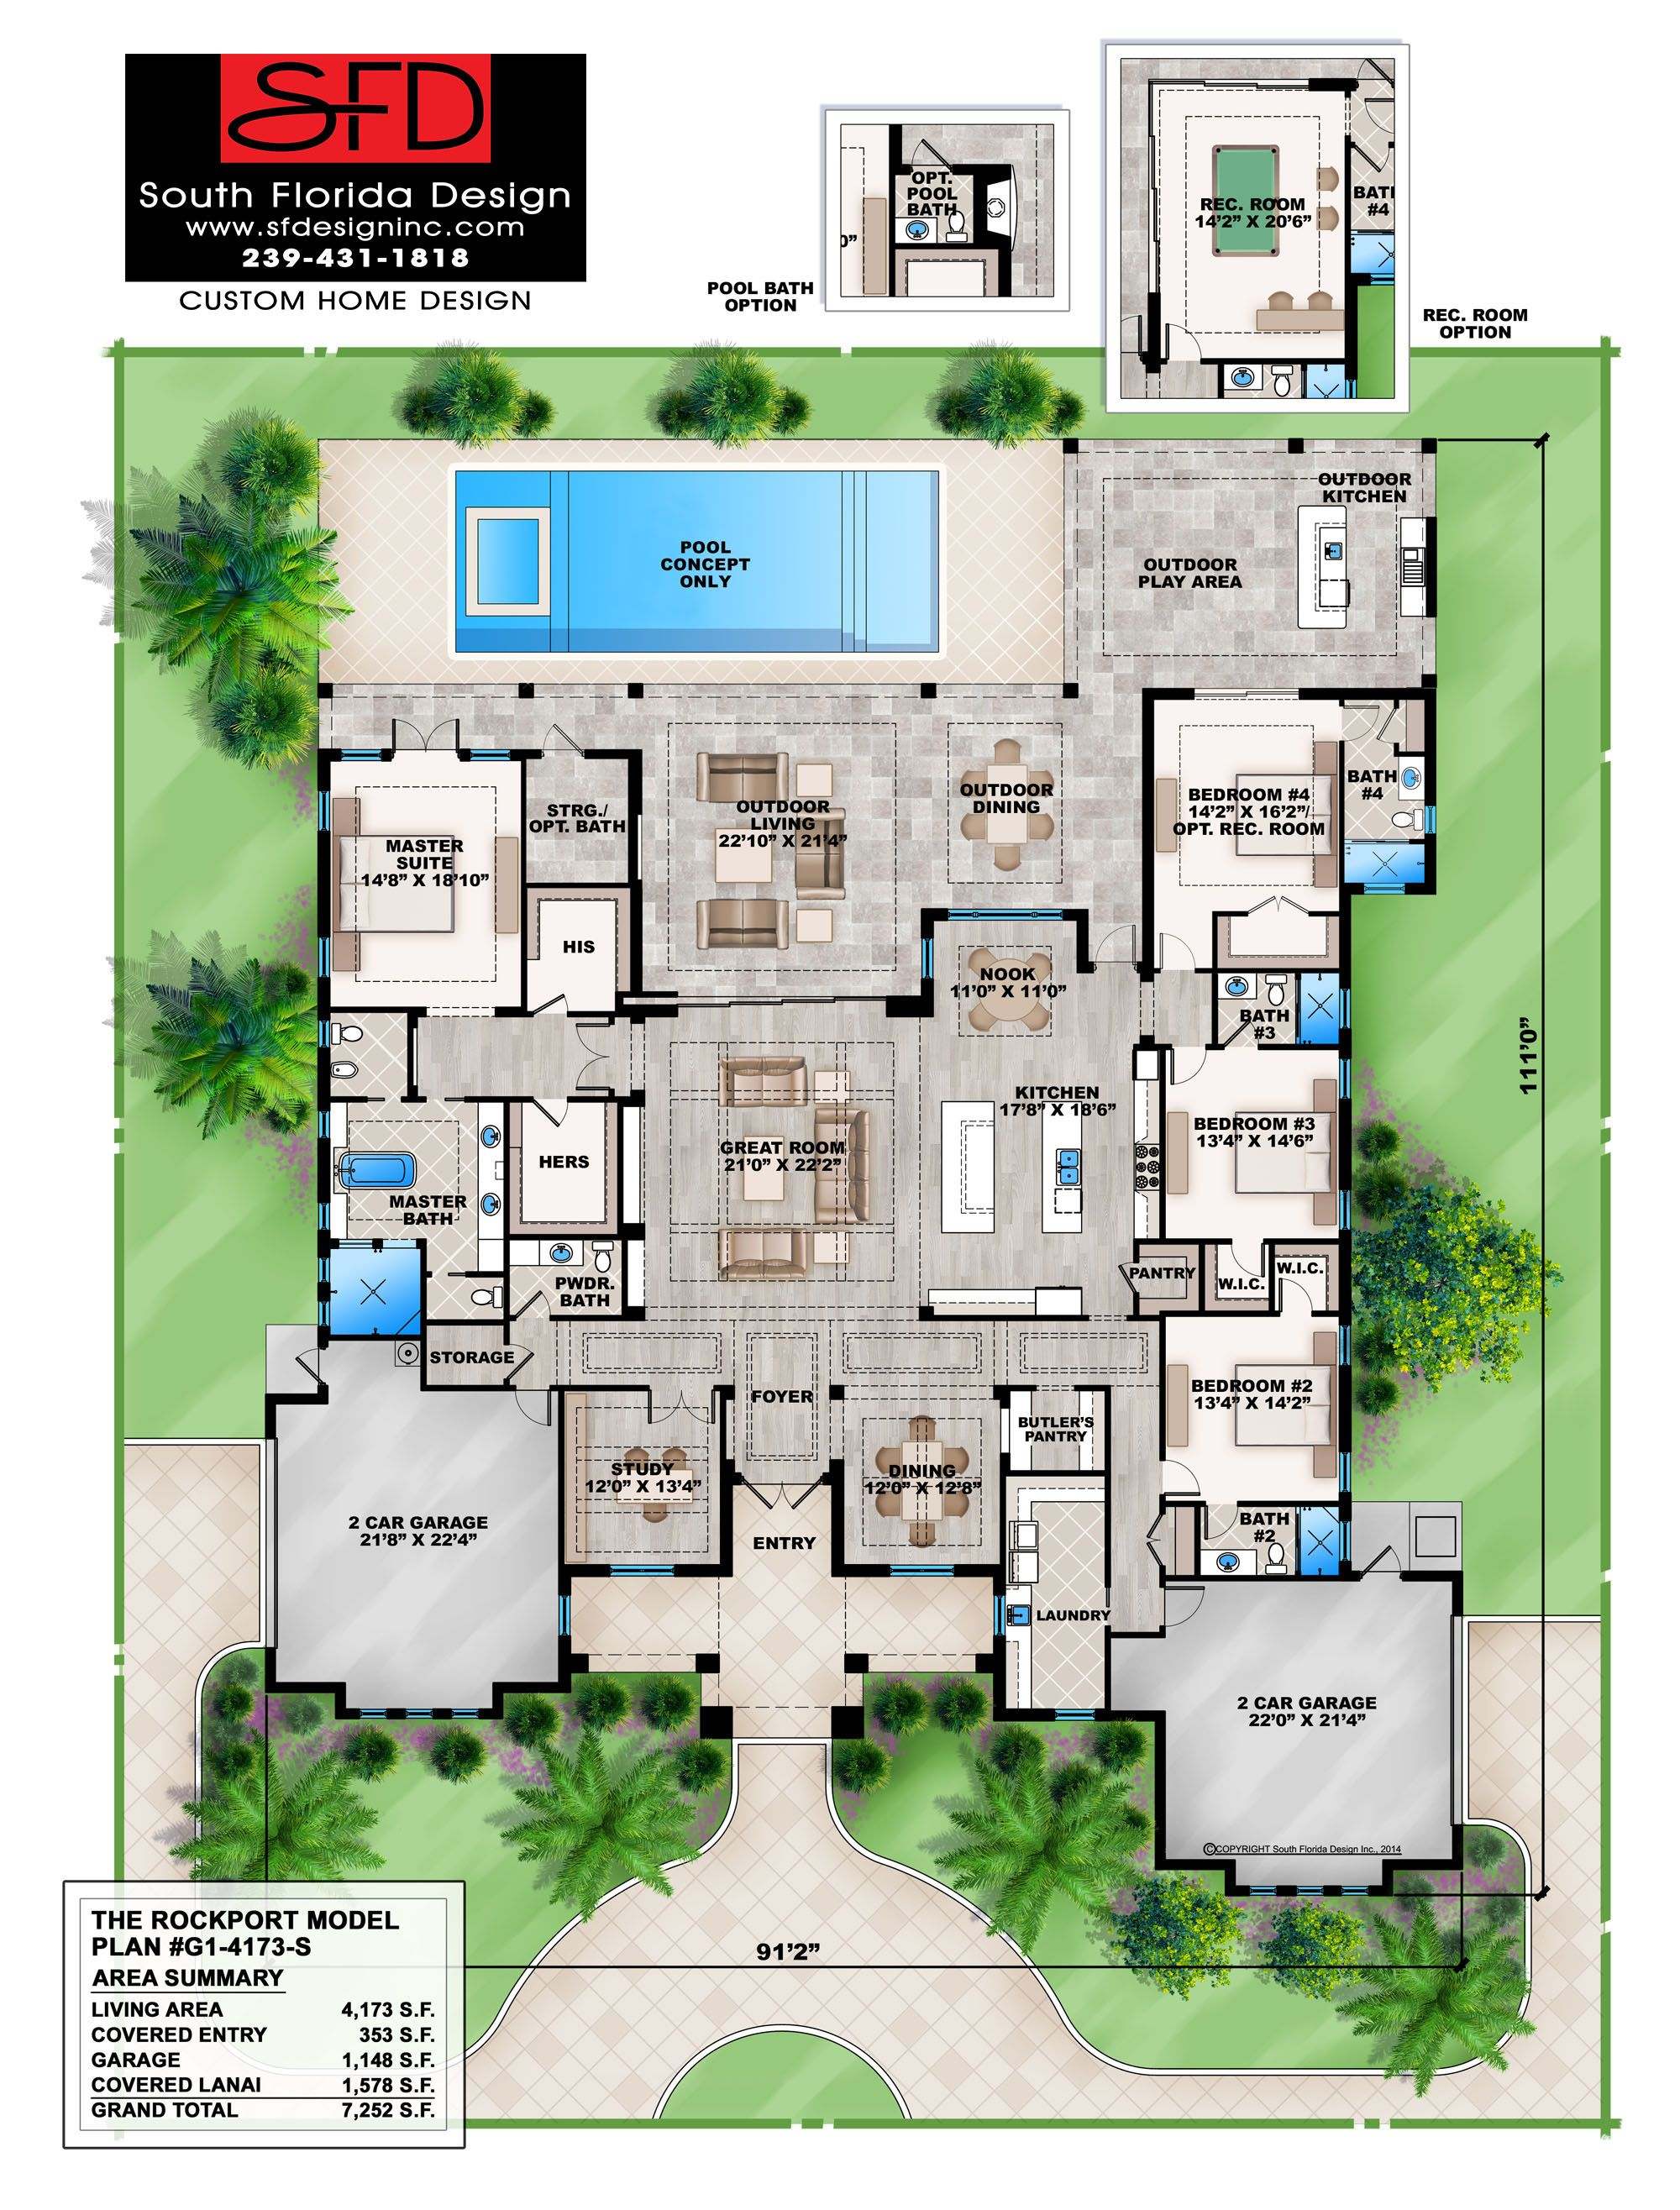 South Florida Designs Contemporary 1 Floor Home Design South Florida Design Florida House Plans Mediterranean Style House Plans Mediterranean House Plan